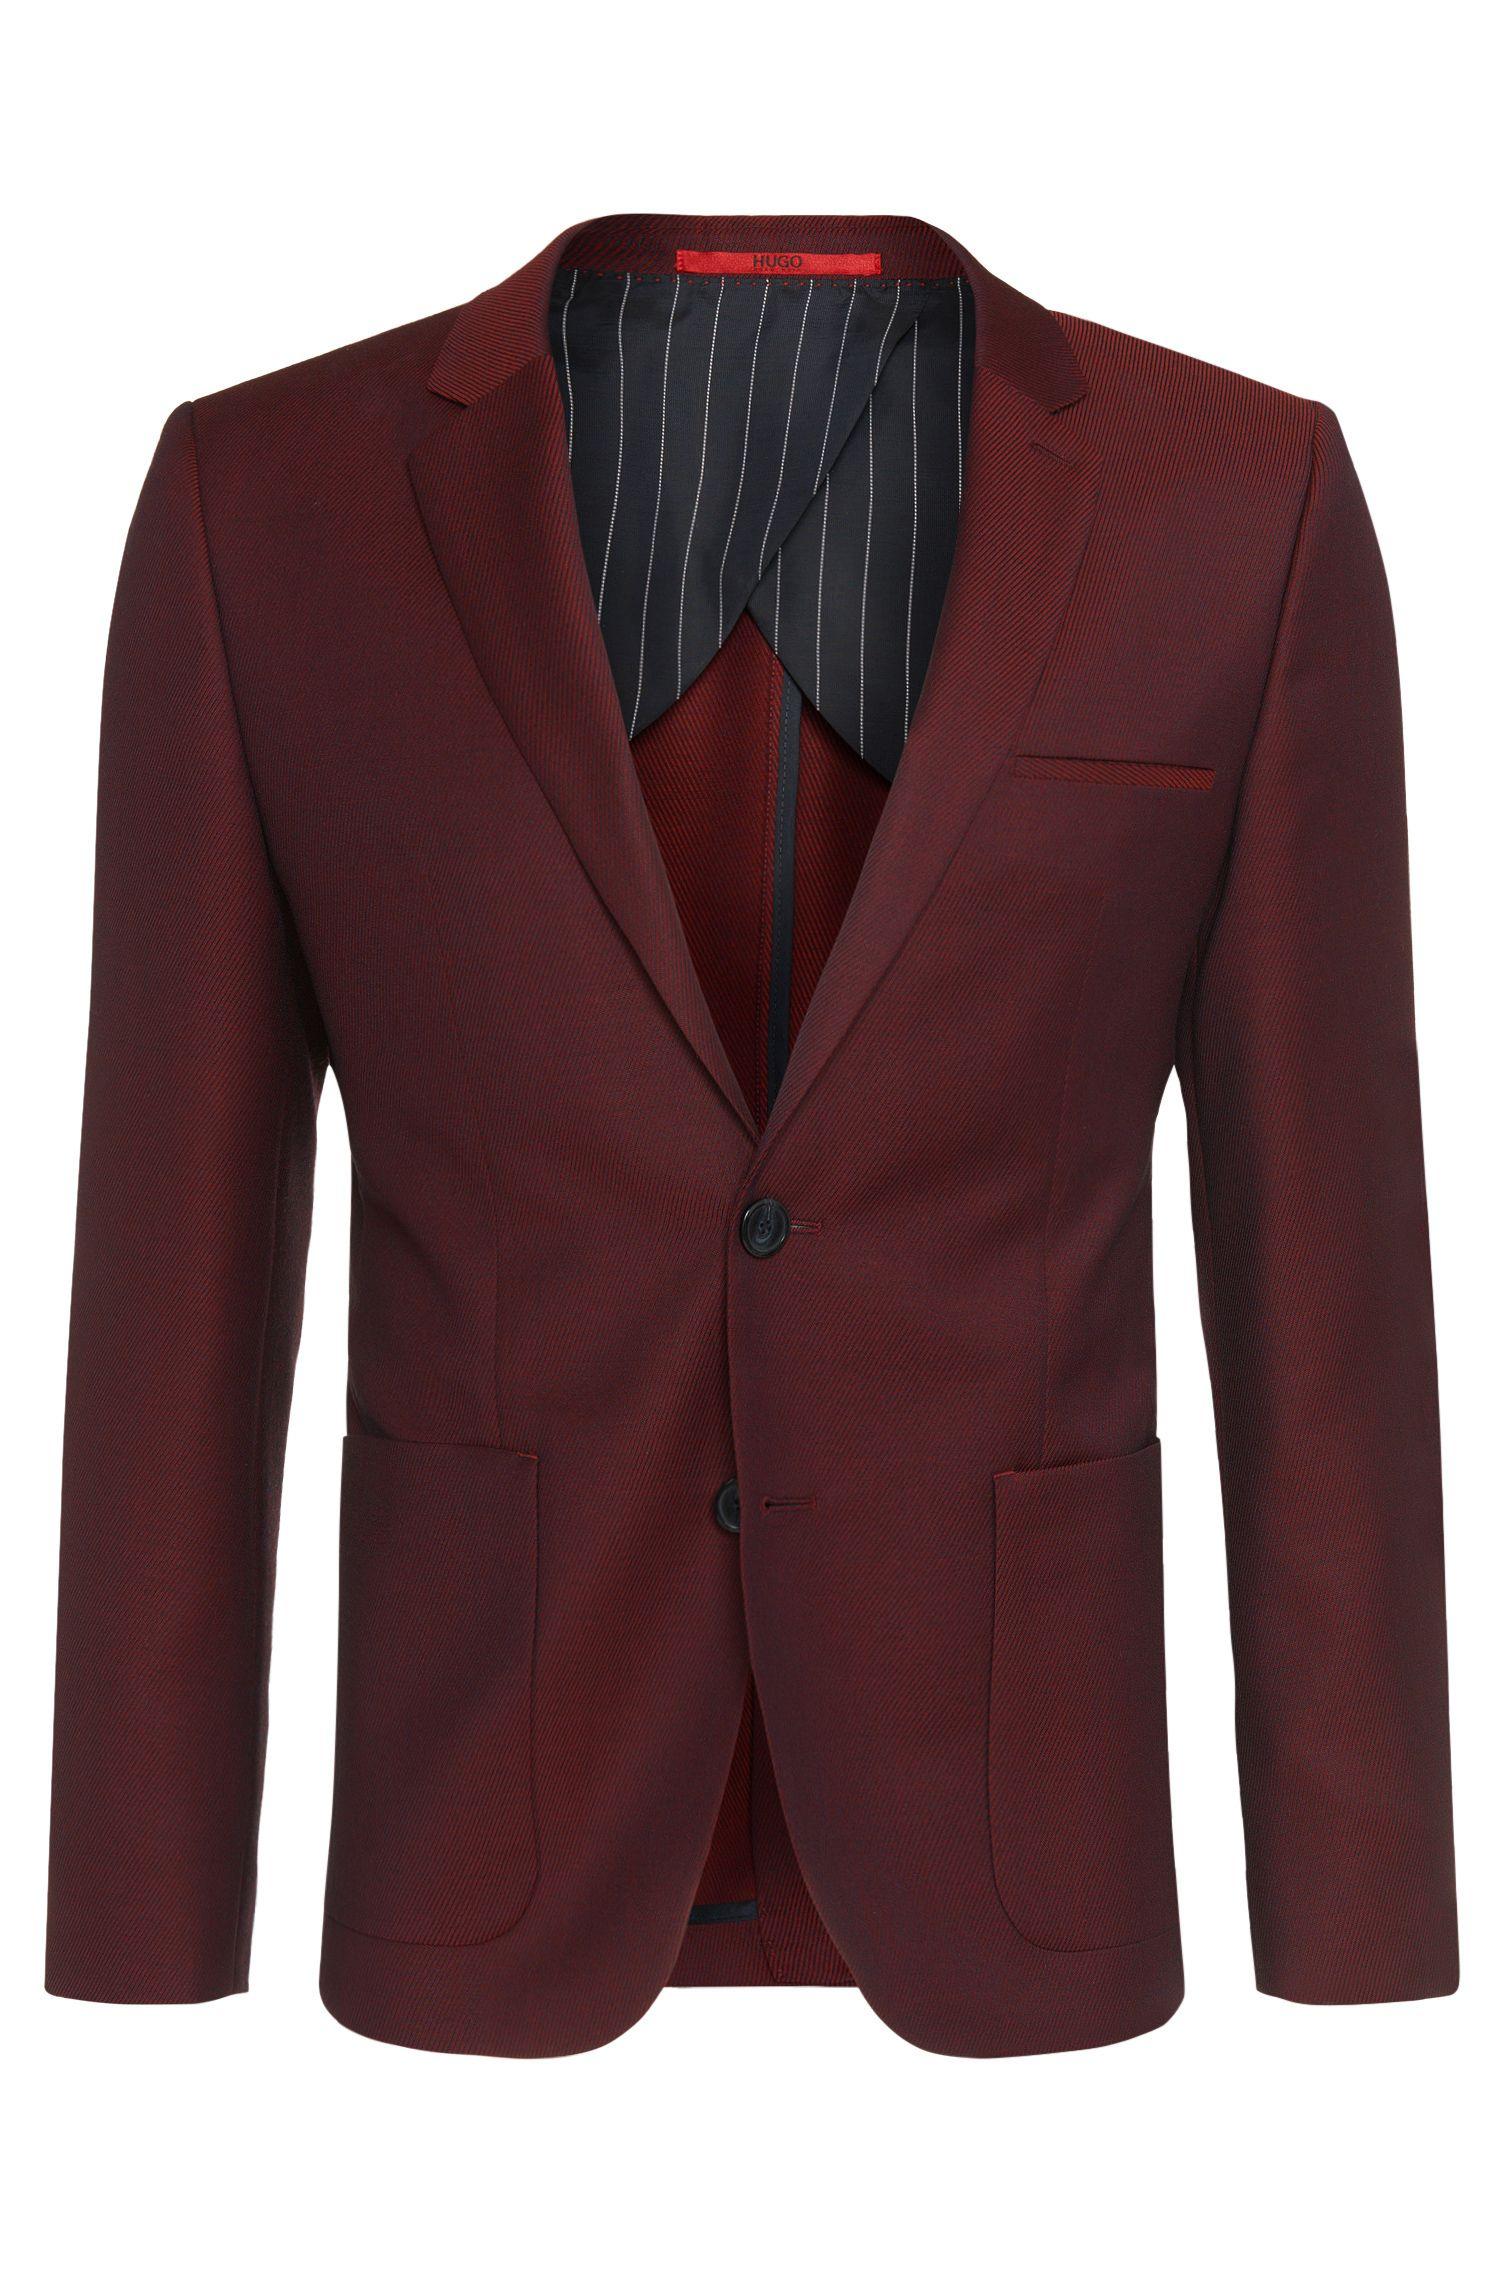 'Antano' | Slim Fit, Virgin Wool Contrast Twill Sport Coat